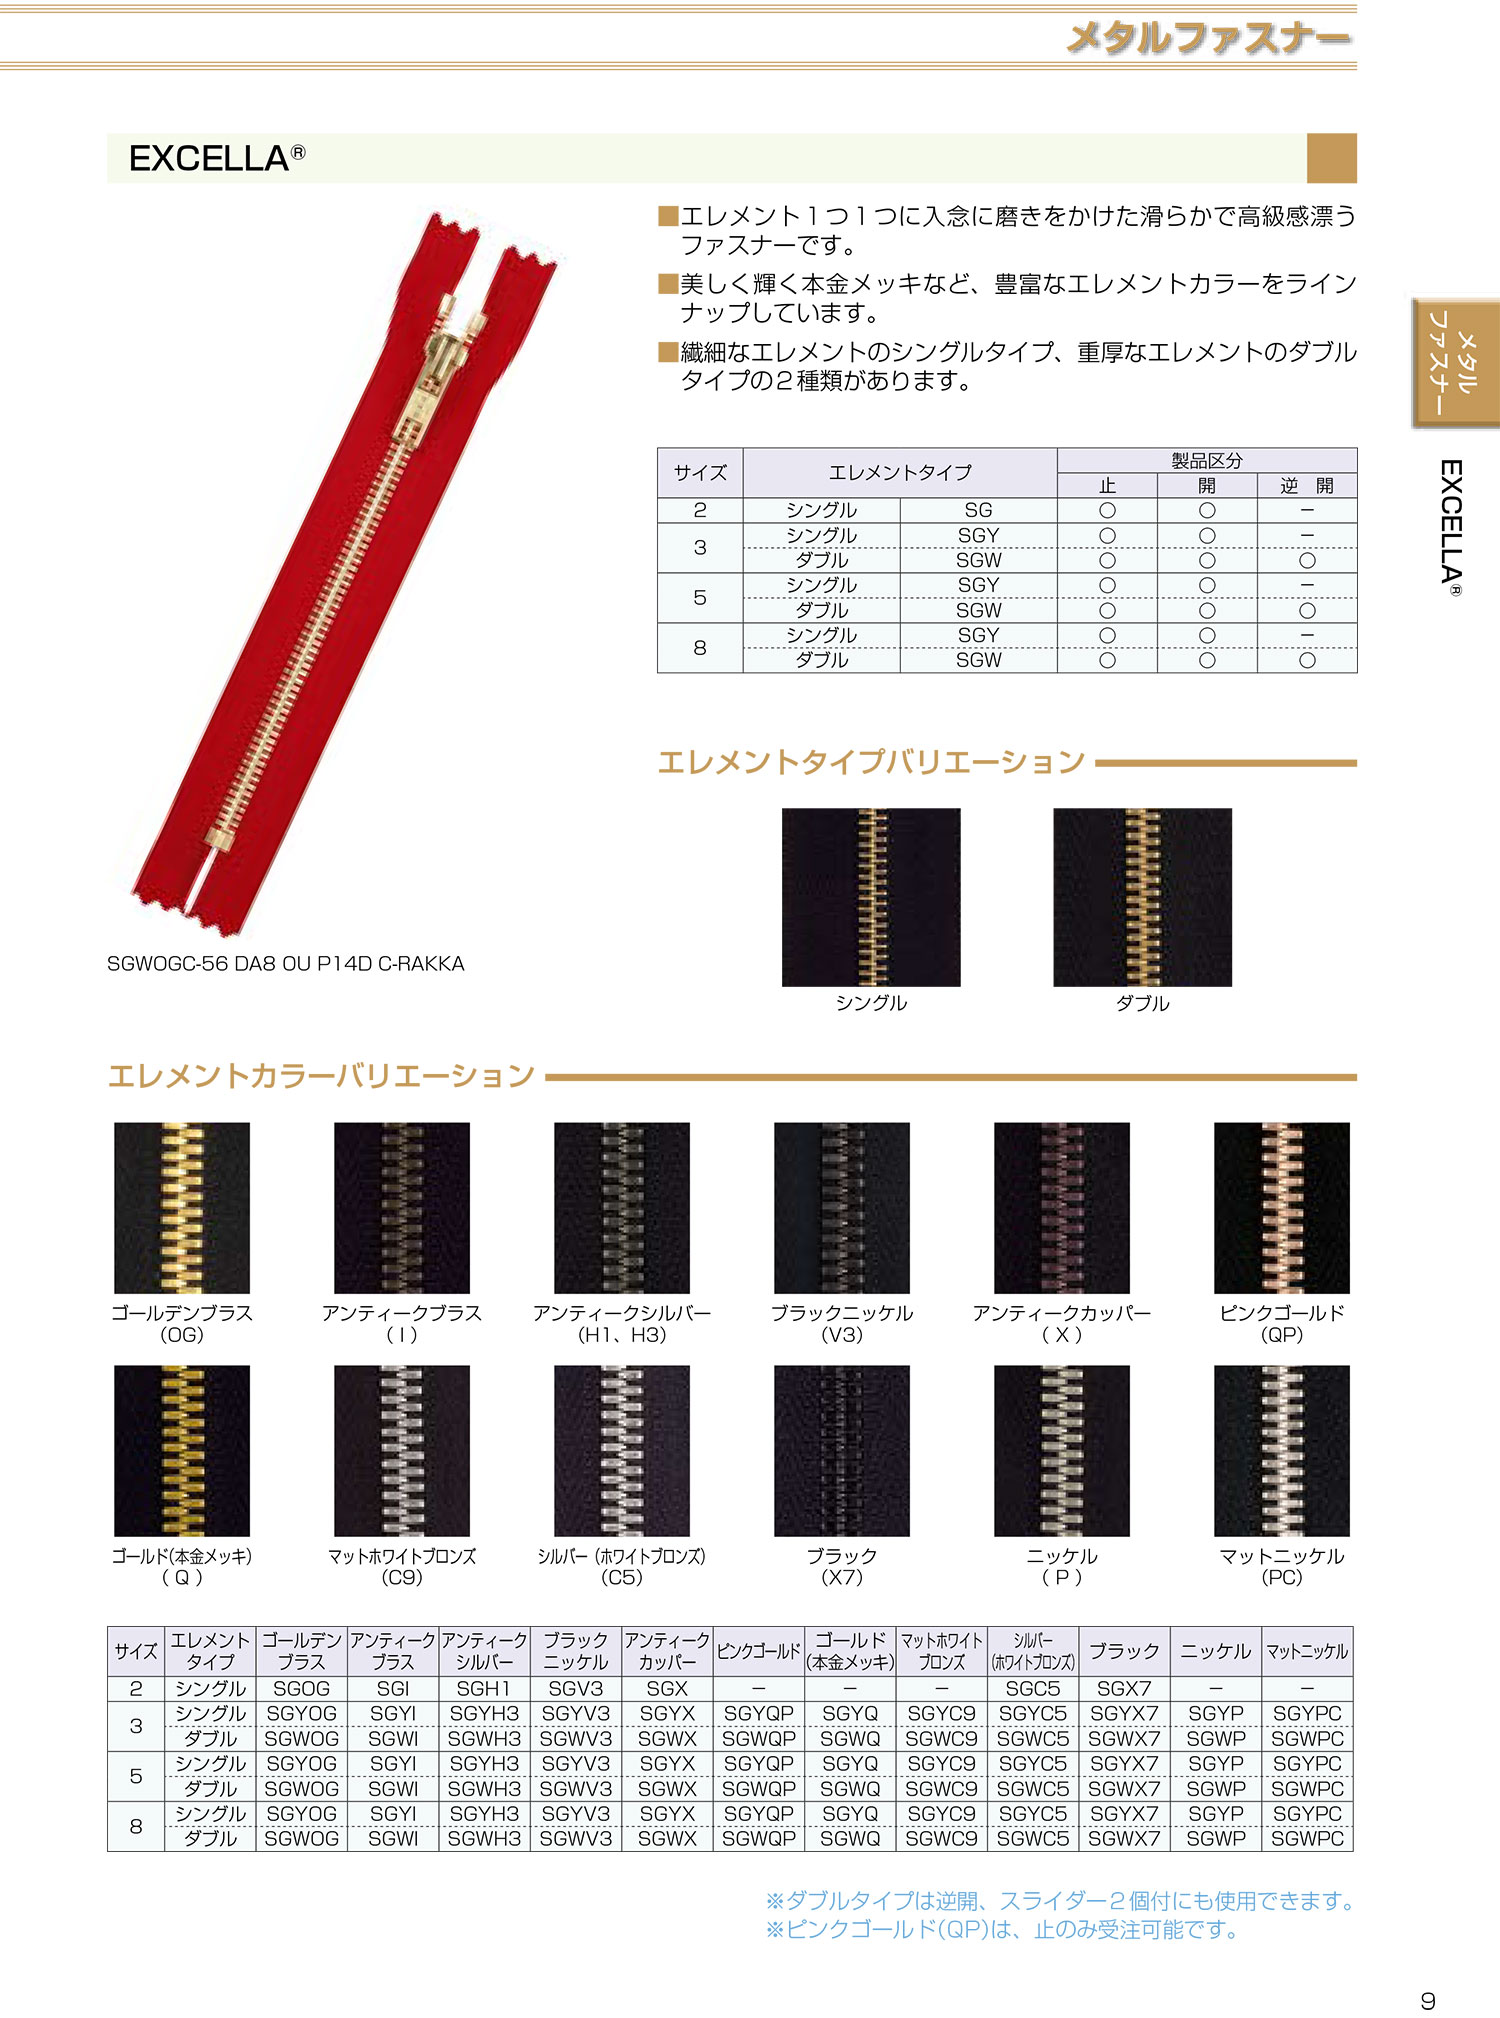 8SGYX7OR エクセラ 8サイズ ブラック オープン シングル[ファスナー] YKK/オークラ商事 - ApparelX アパレル資材卸通販